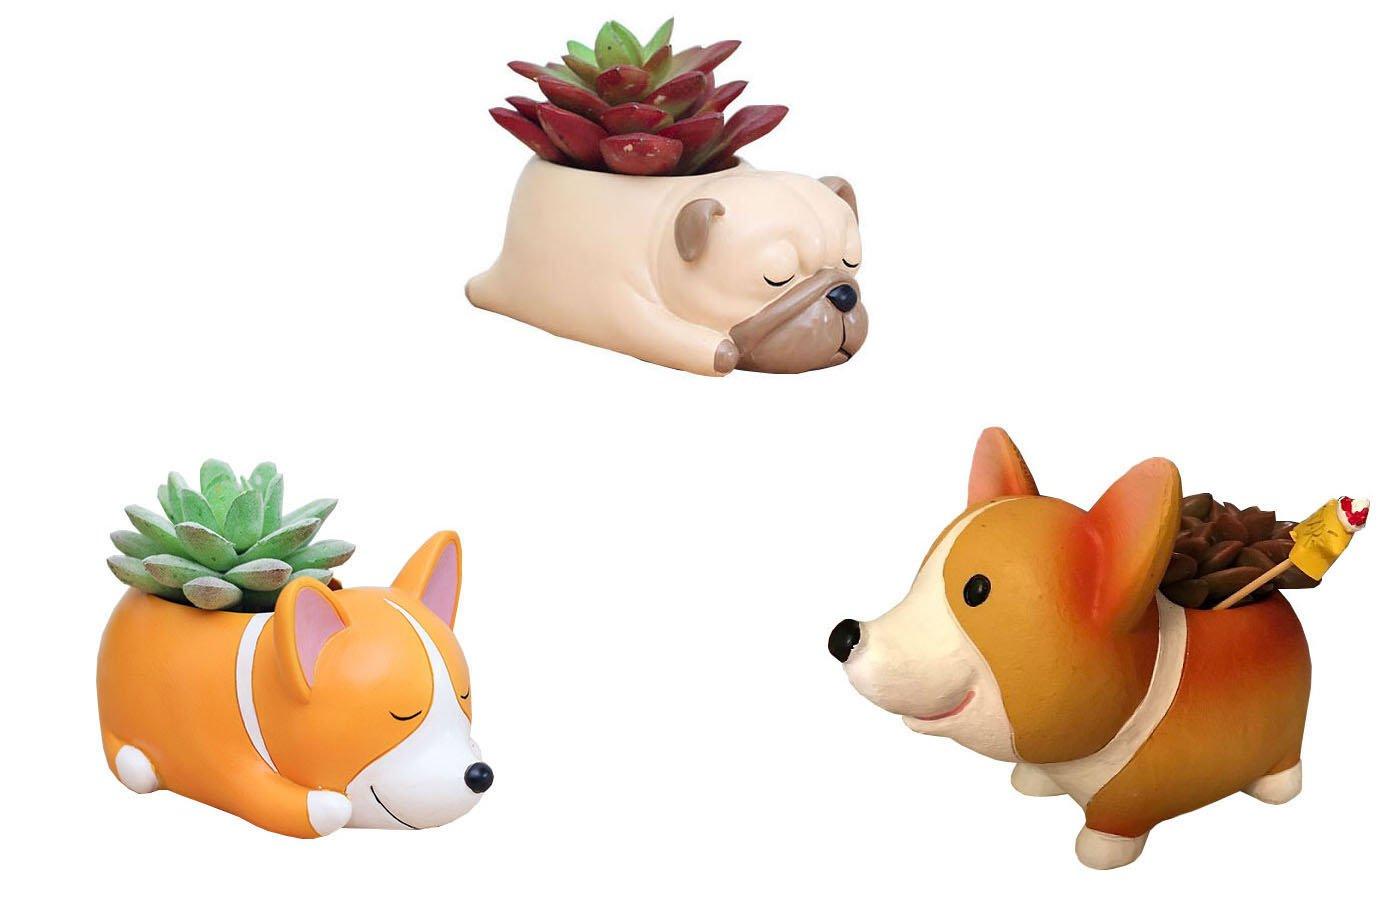 Everyday Better Life 3 PCS Set Cute Cartoon Animal Corgi Pug Shaped Succulent Cactus Vase Flower Pot for Home Garden Office Desktop Decoration (Plants Not Included) by Cuteforyou